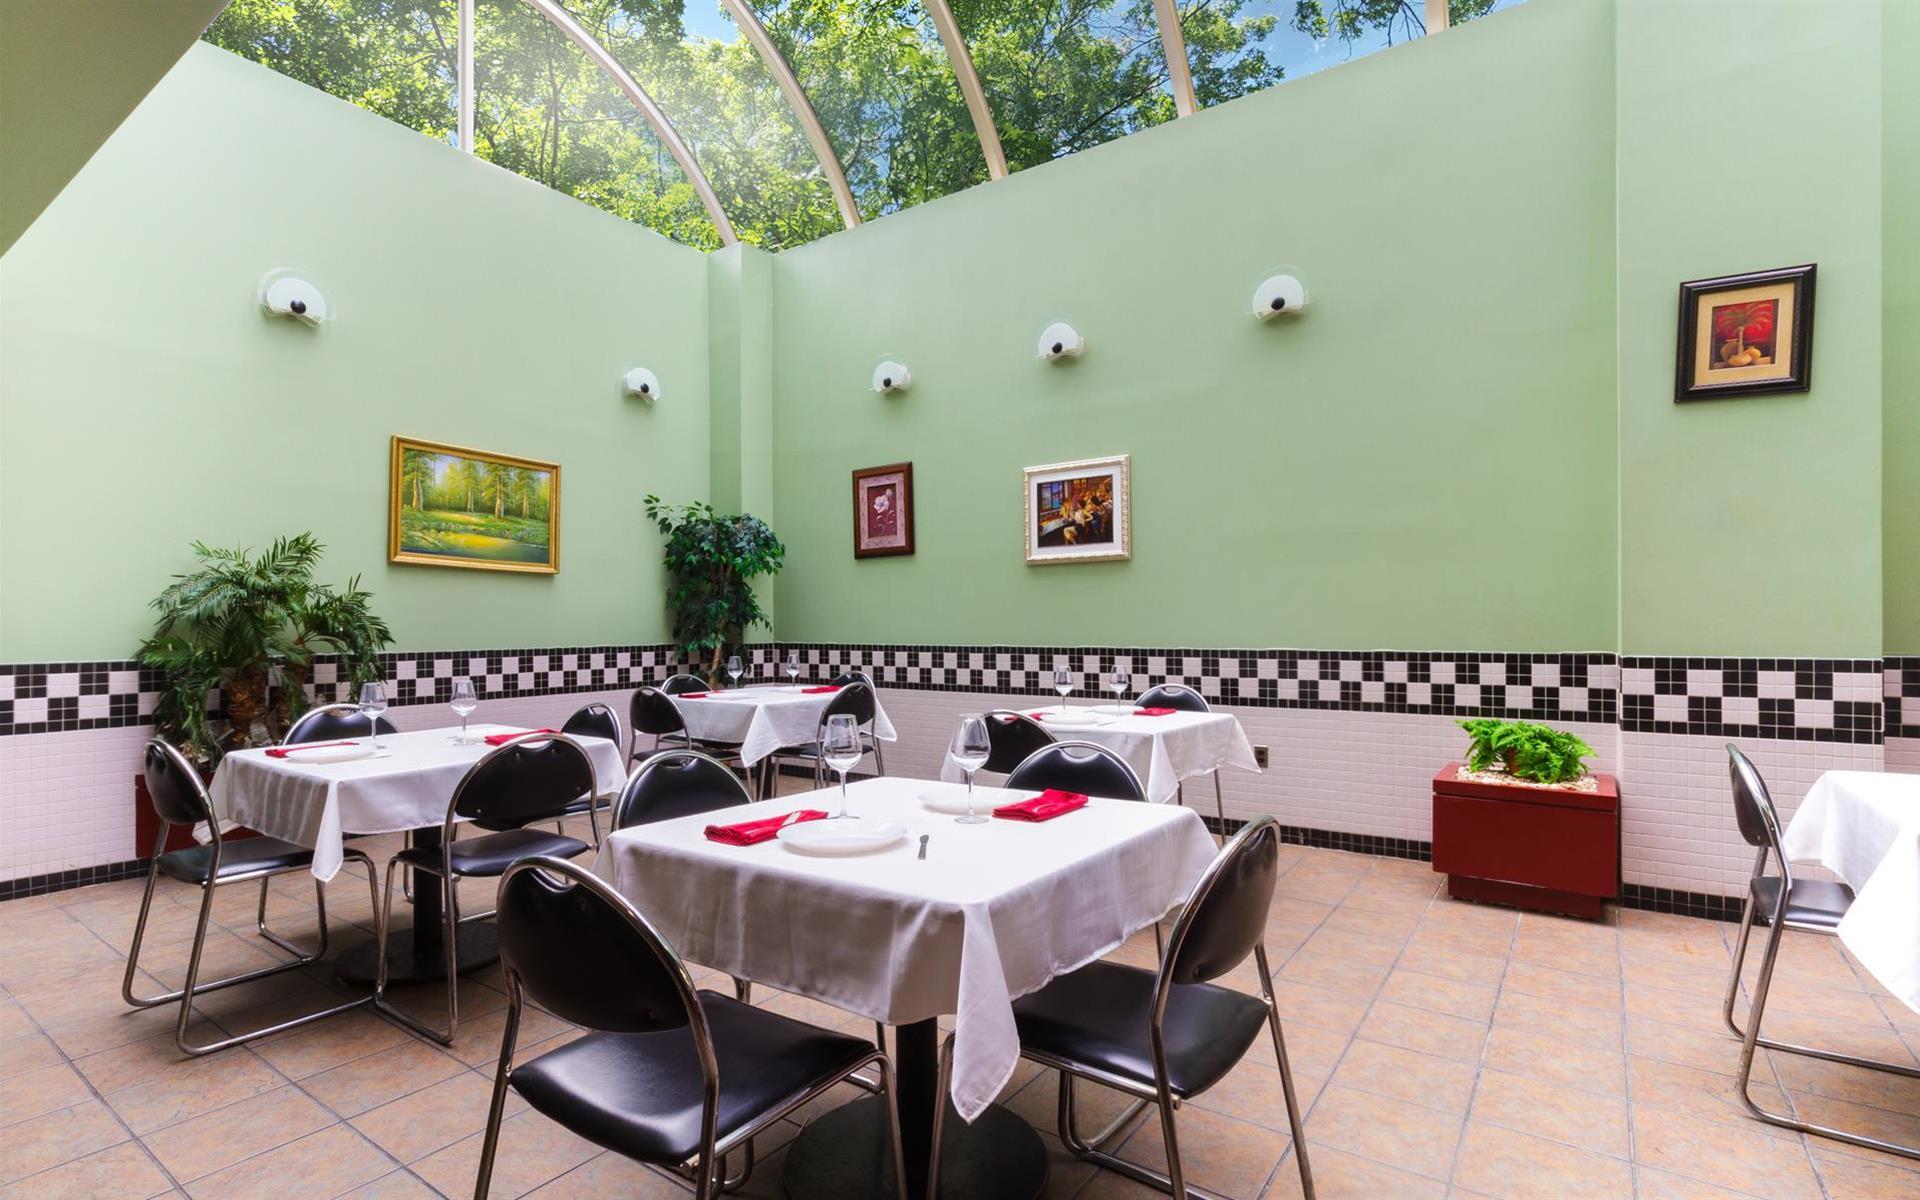 Sunlit Cafe - Sunlit Atrium Cafe